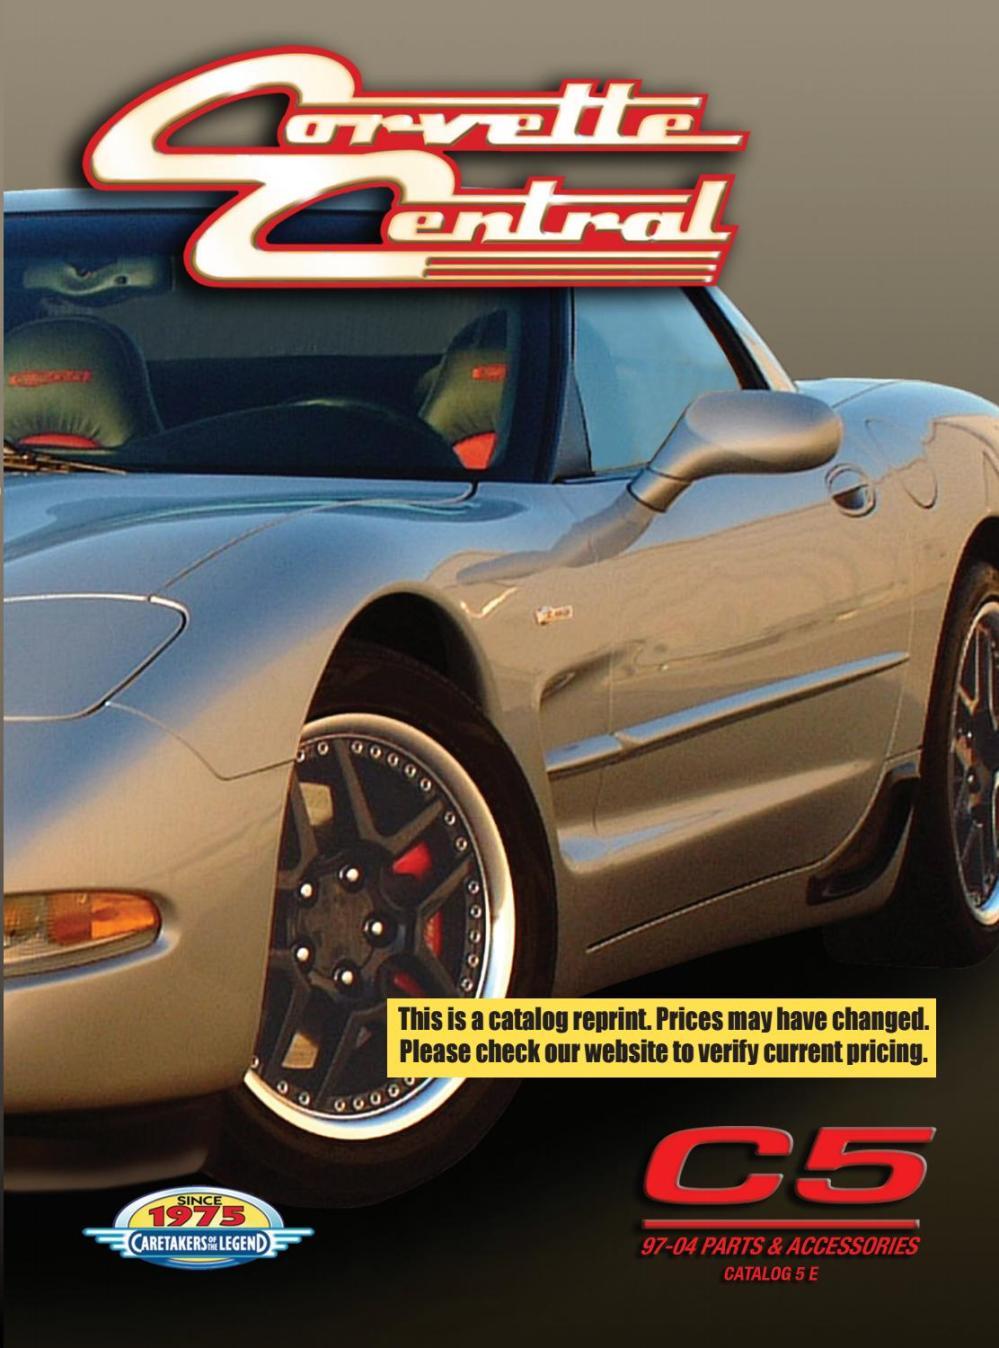 medium resolution of corvette central c5 97 04 corvette parts catalog by corvette central issuu